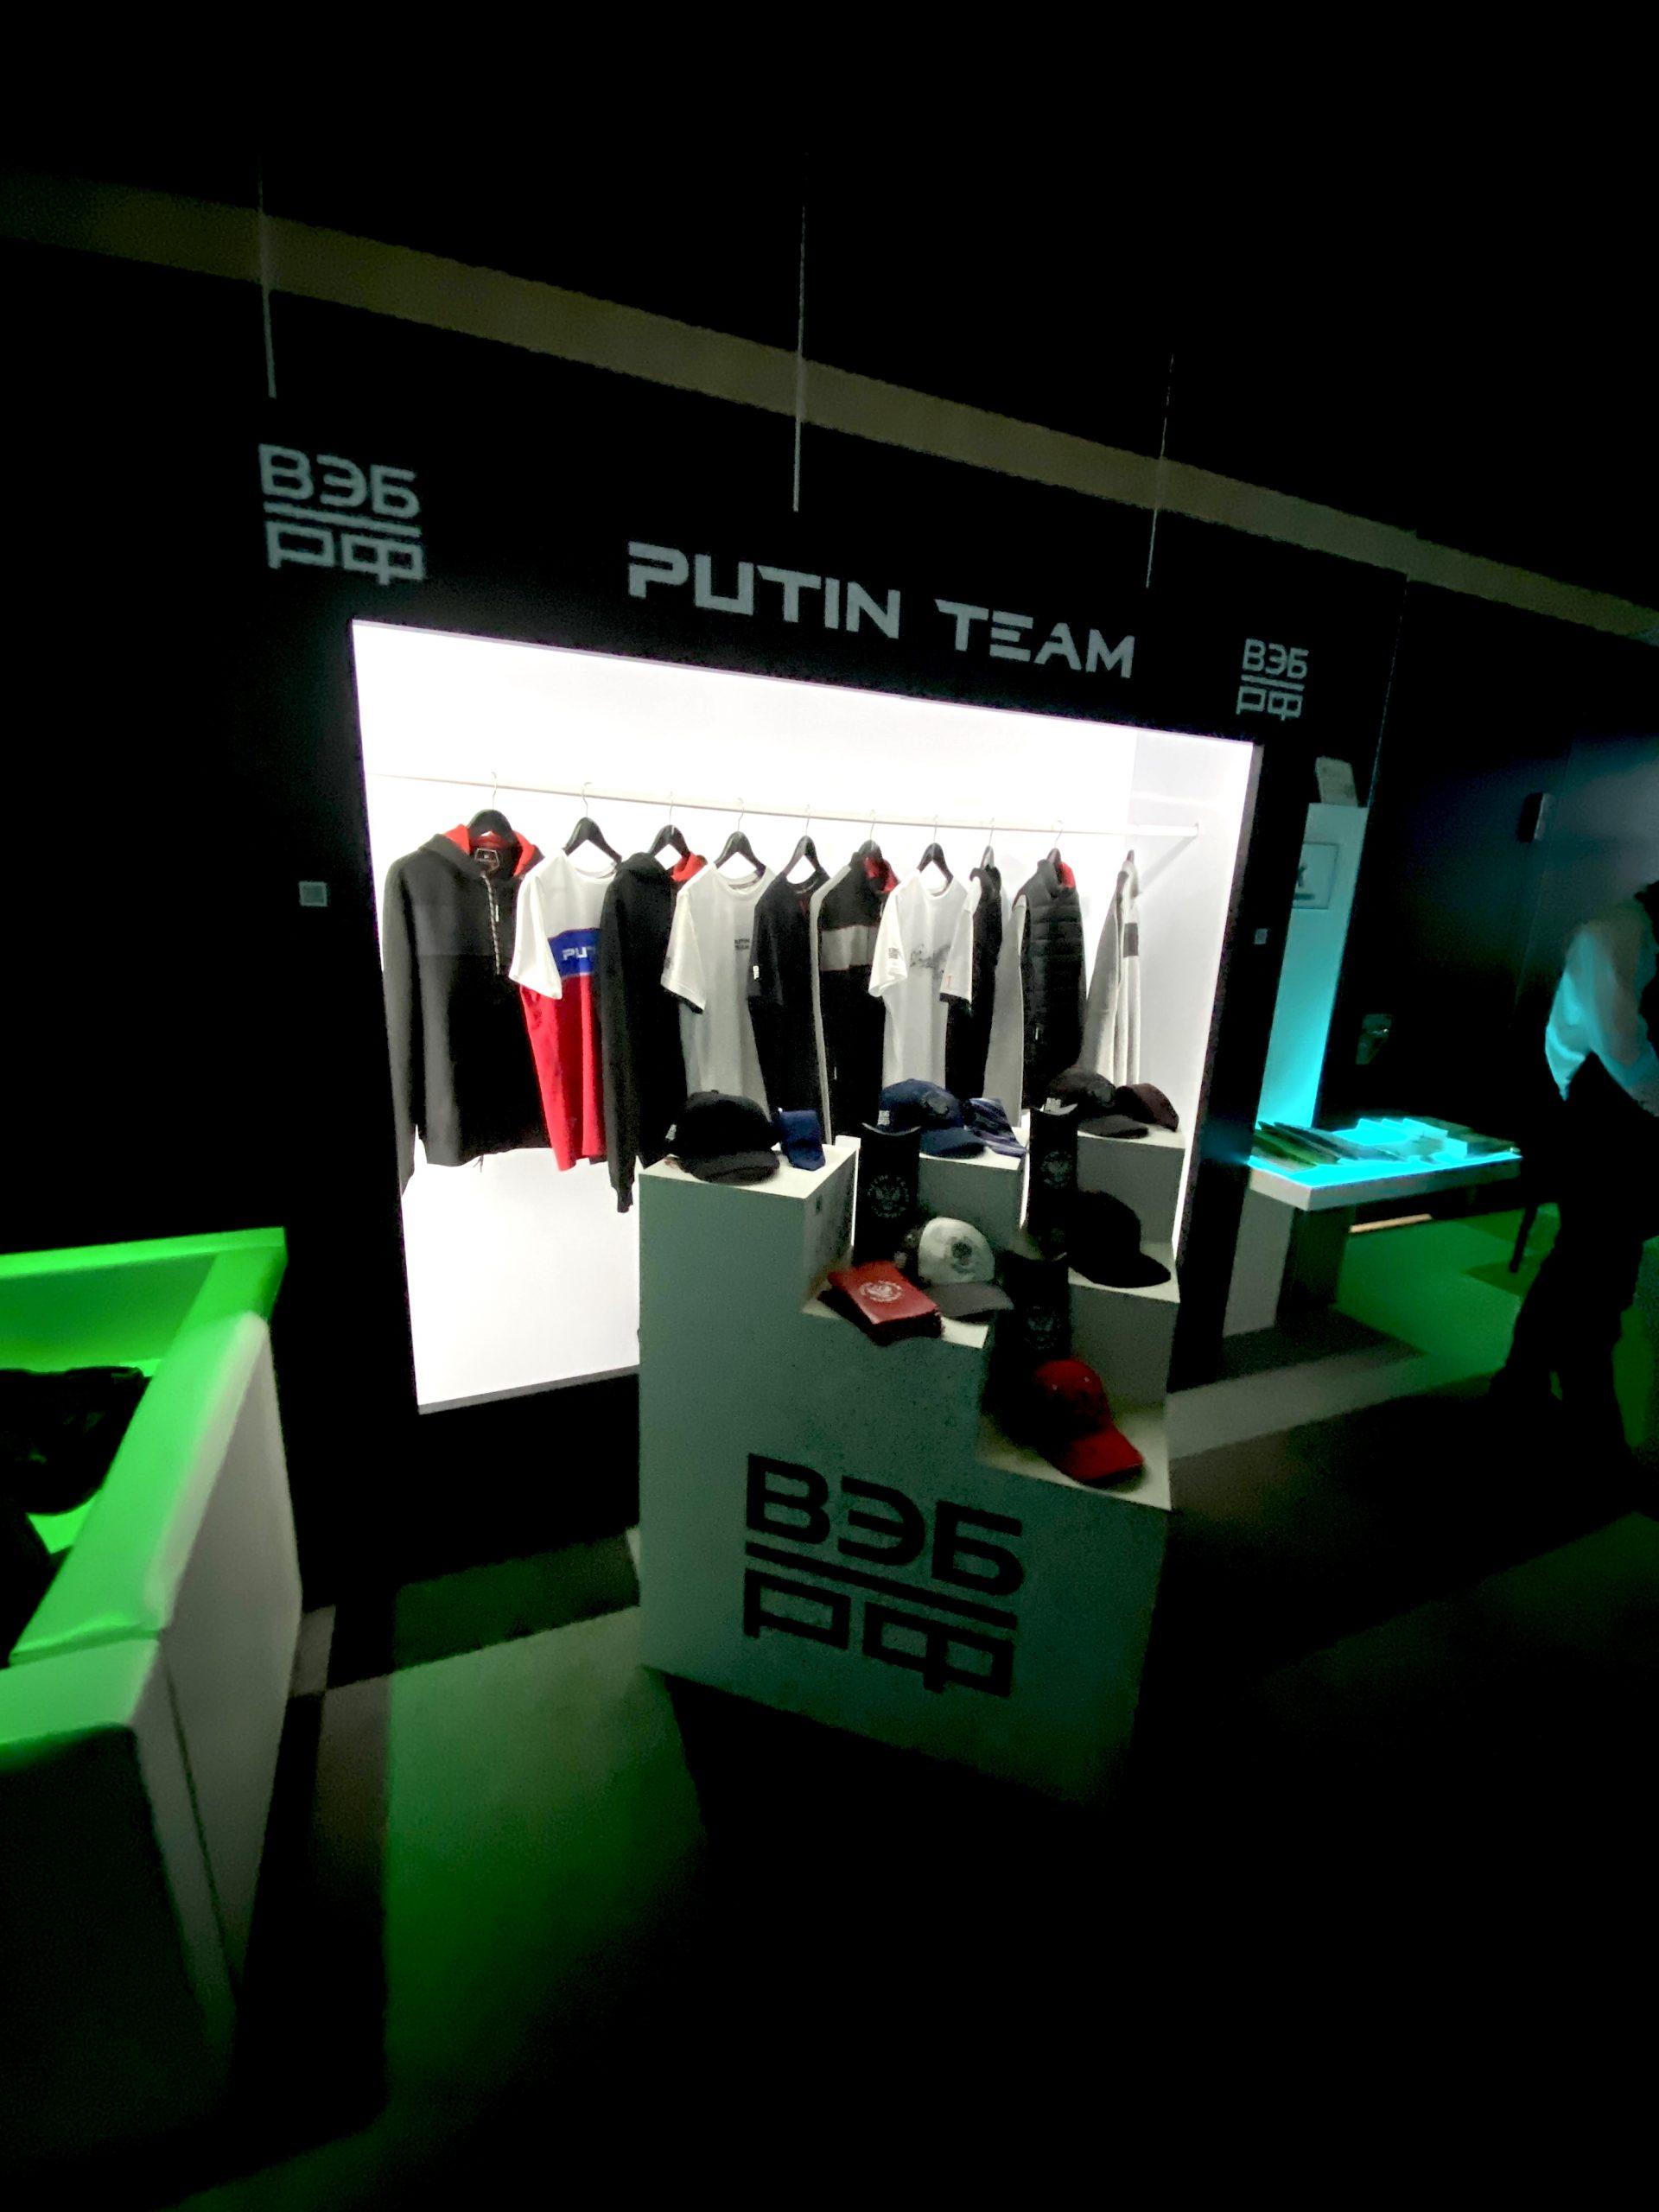 ПМЭФ-2021: Новая коллекция Putin Team представлена на стенде ВЭБ.РФ